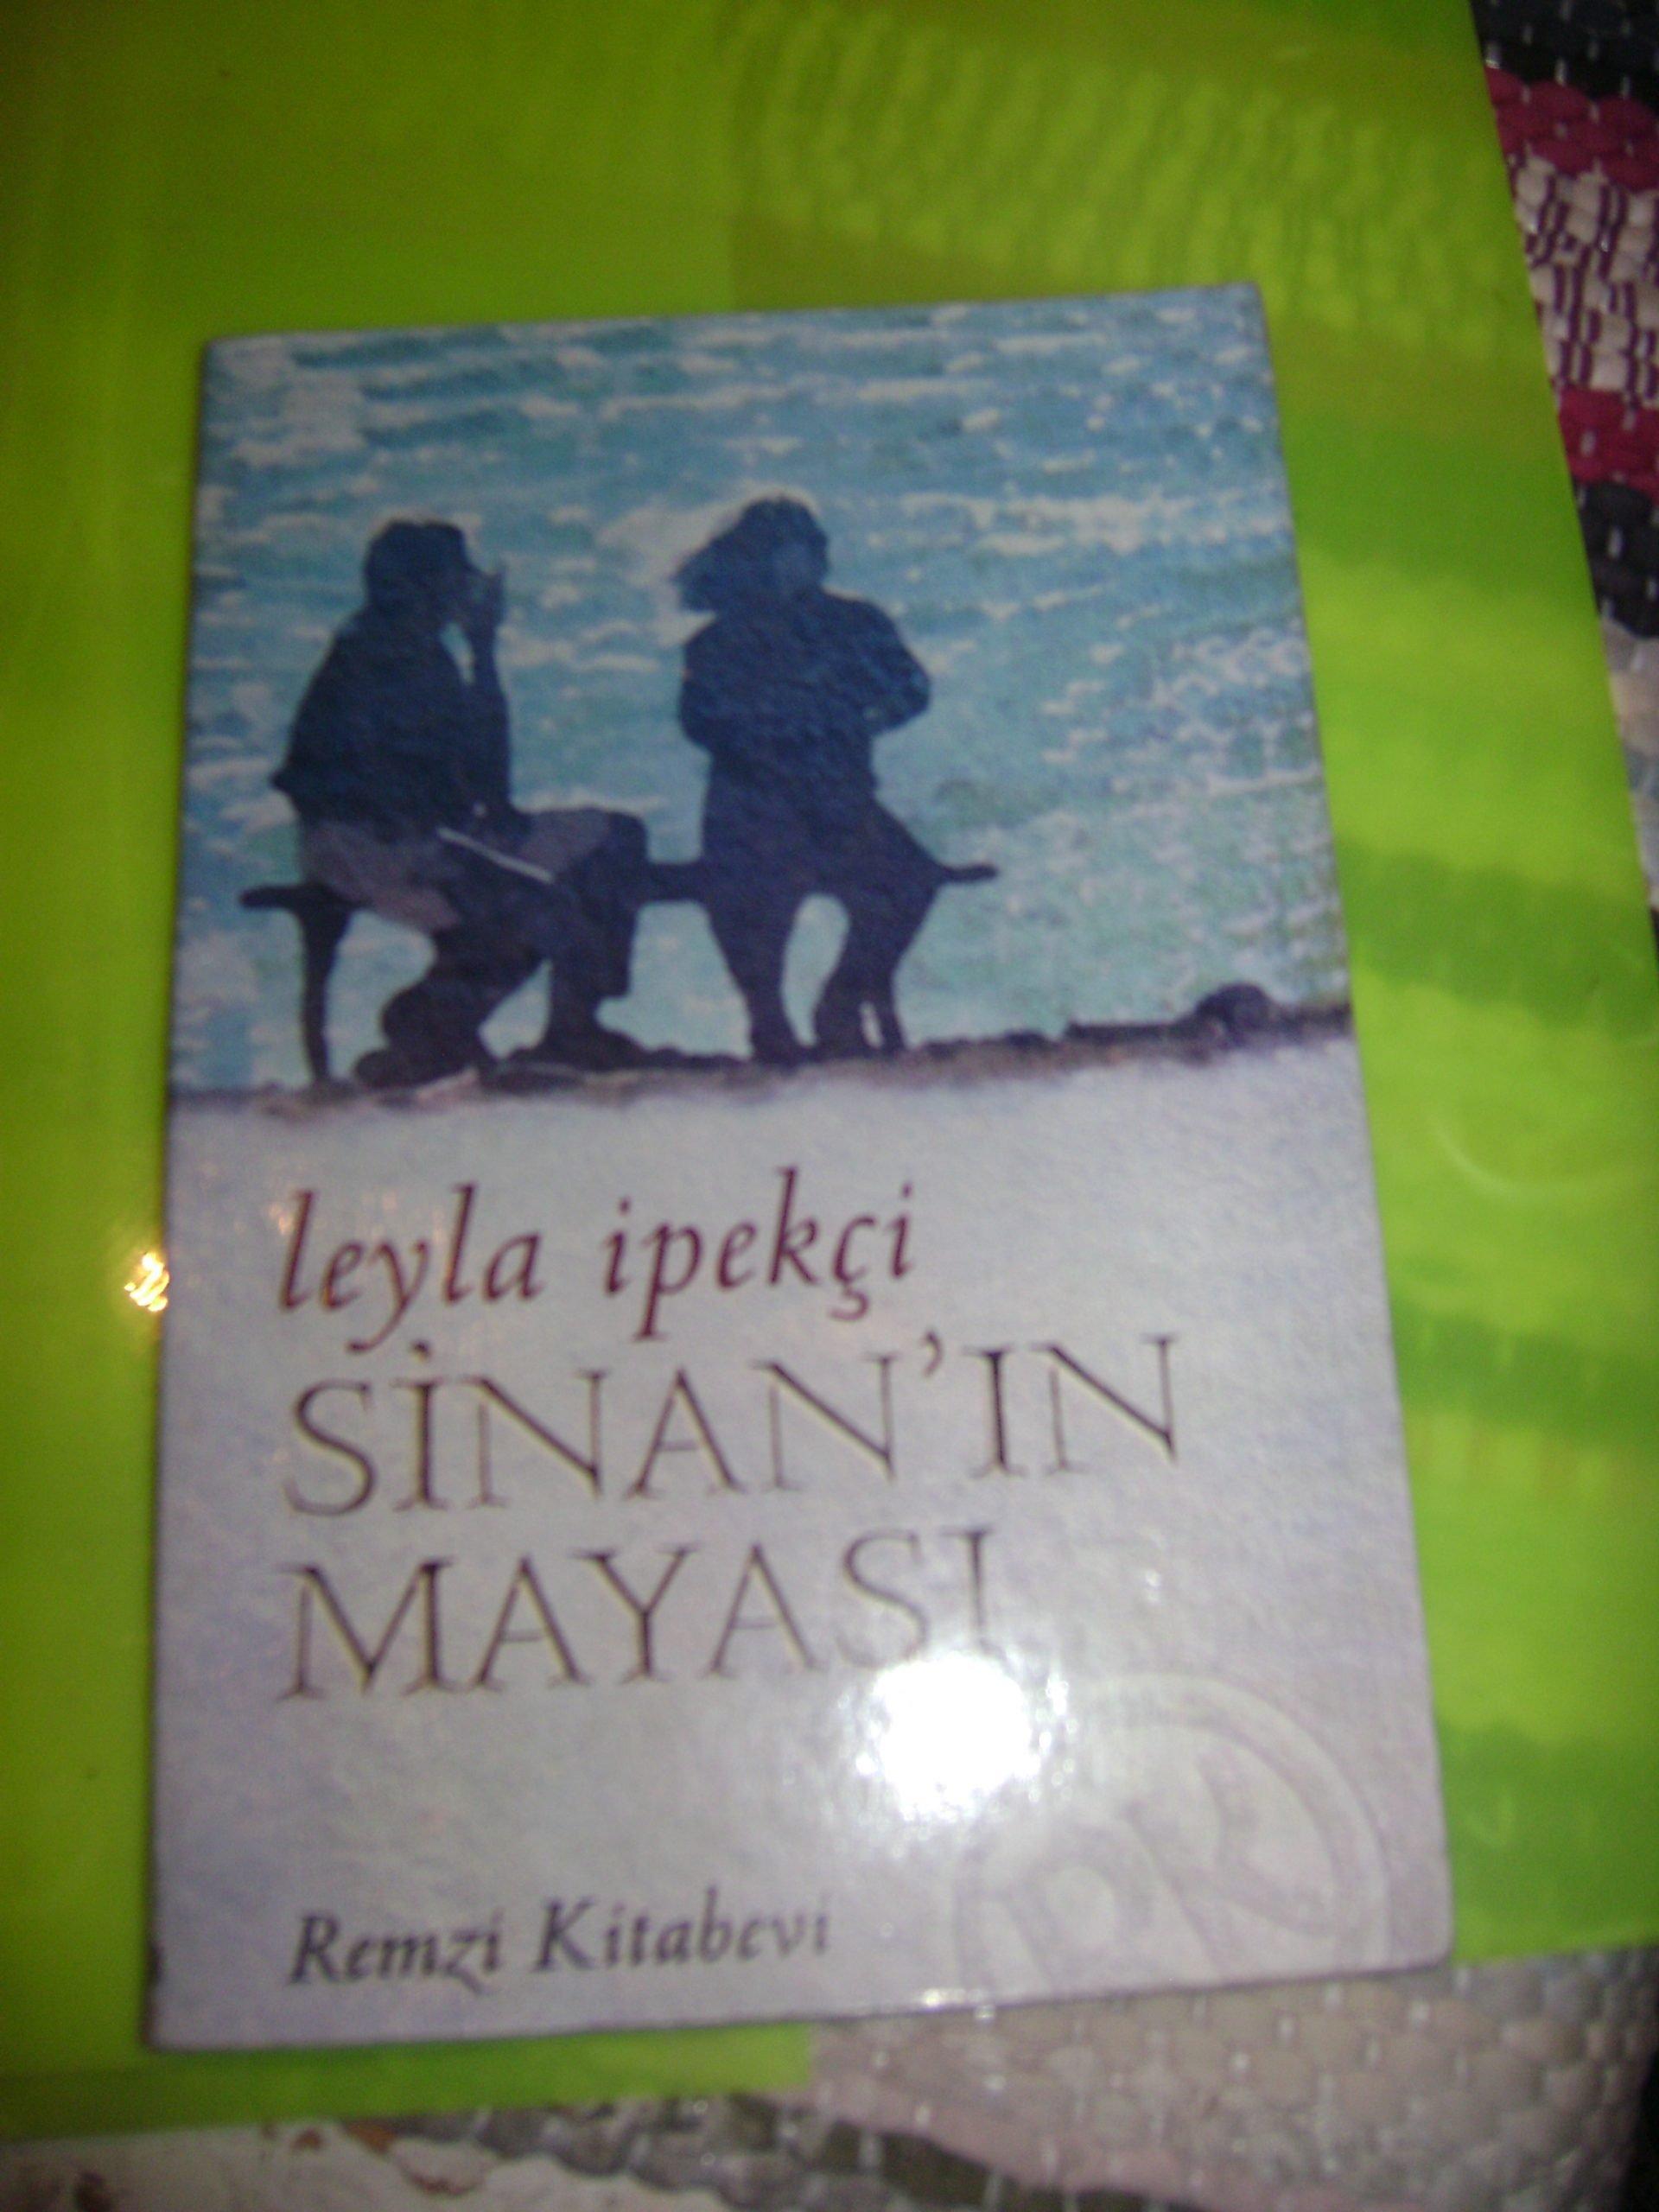 SİNAN'IN MAYASI/Leyla İPEKÇİ/ 10 tl